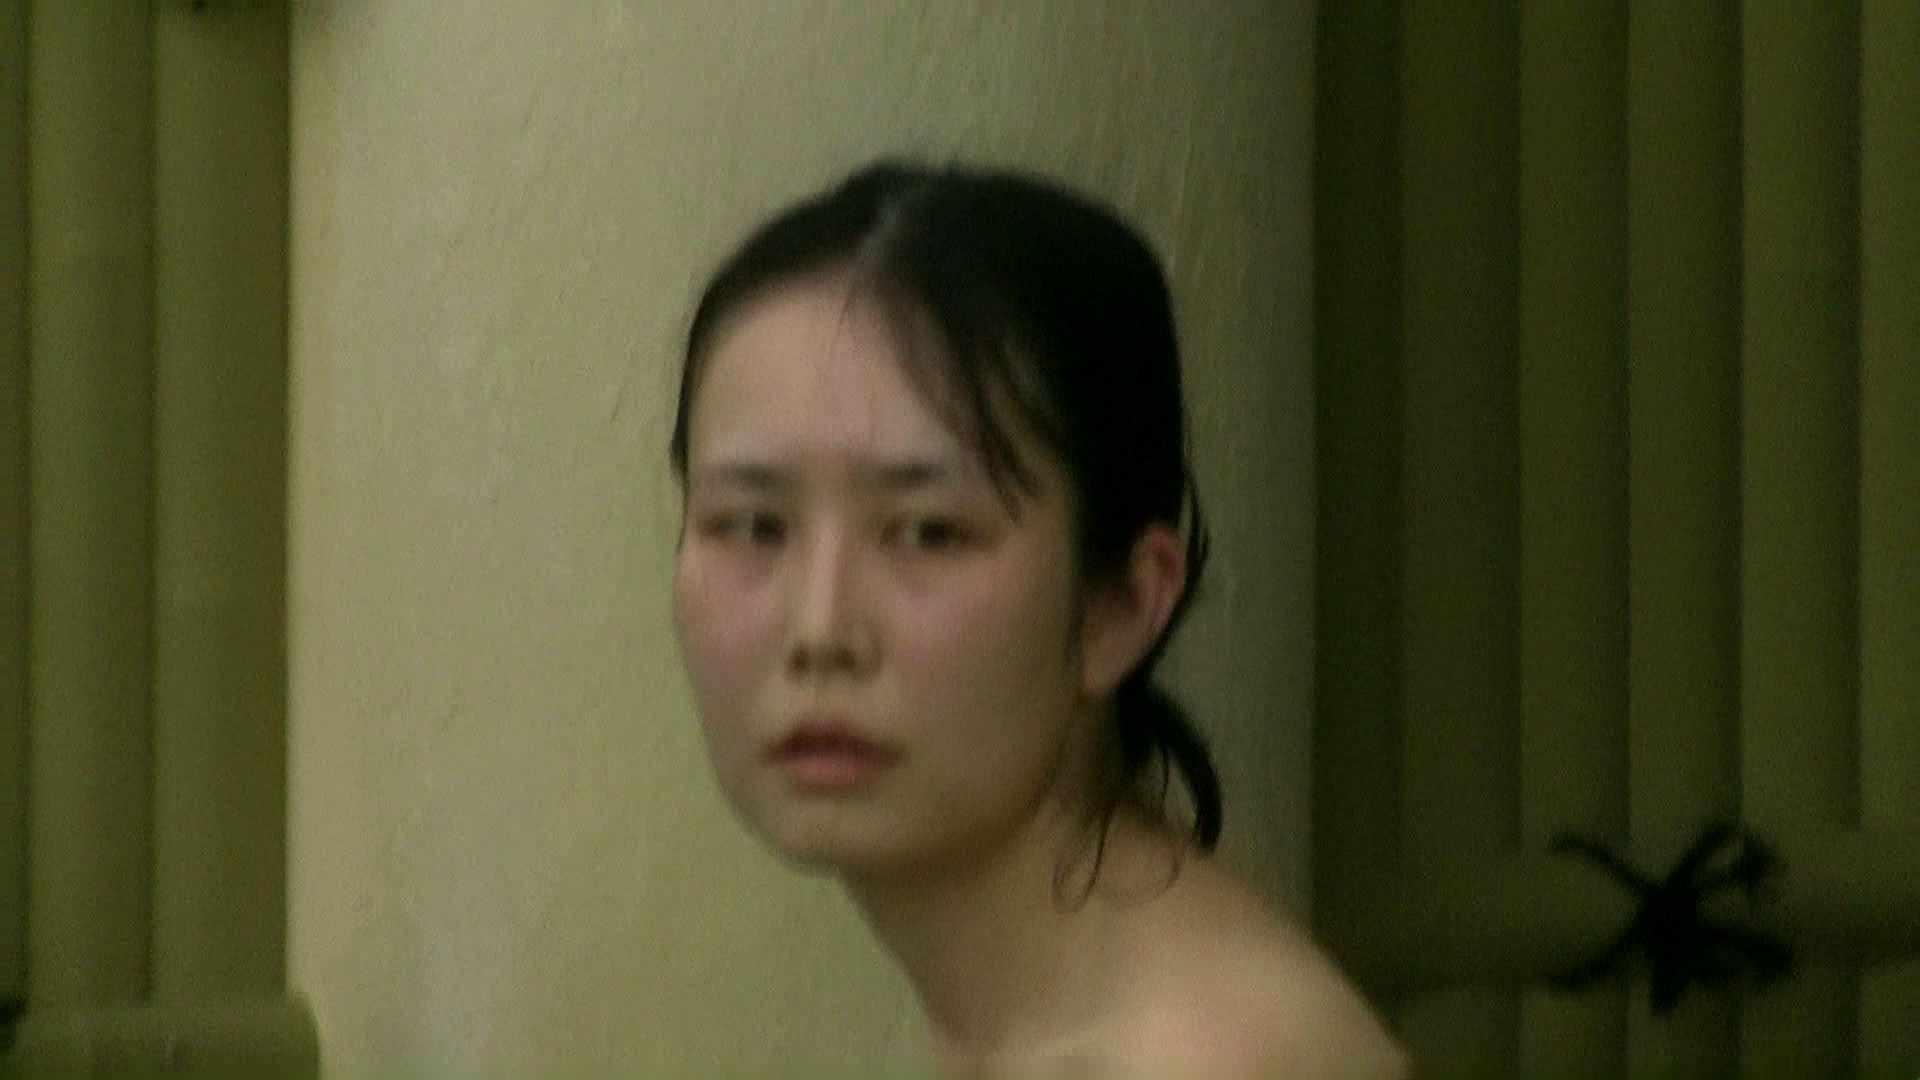 Aquaな露天風呂Vol.636 HなOL | 盗撮  82pic 58